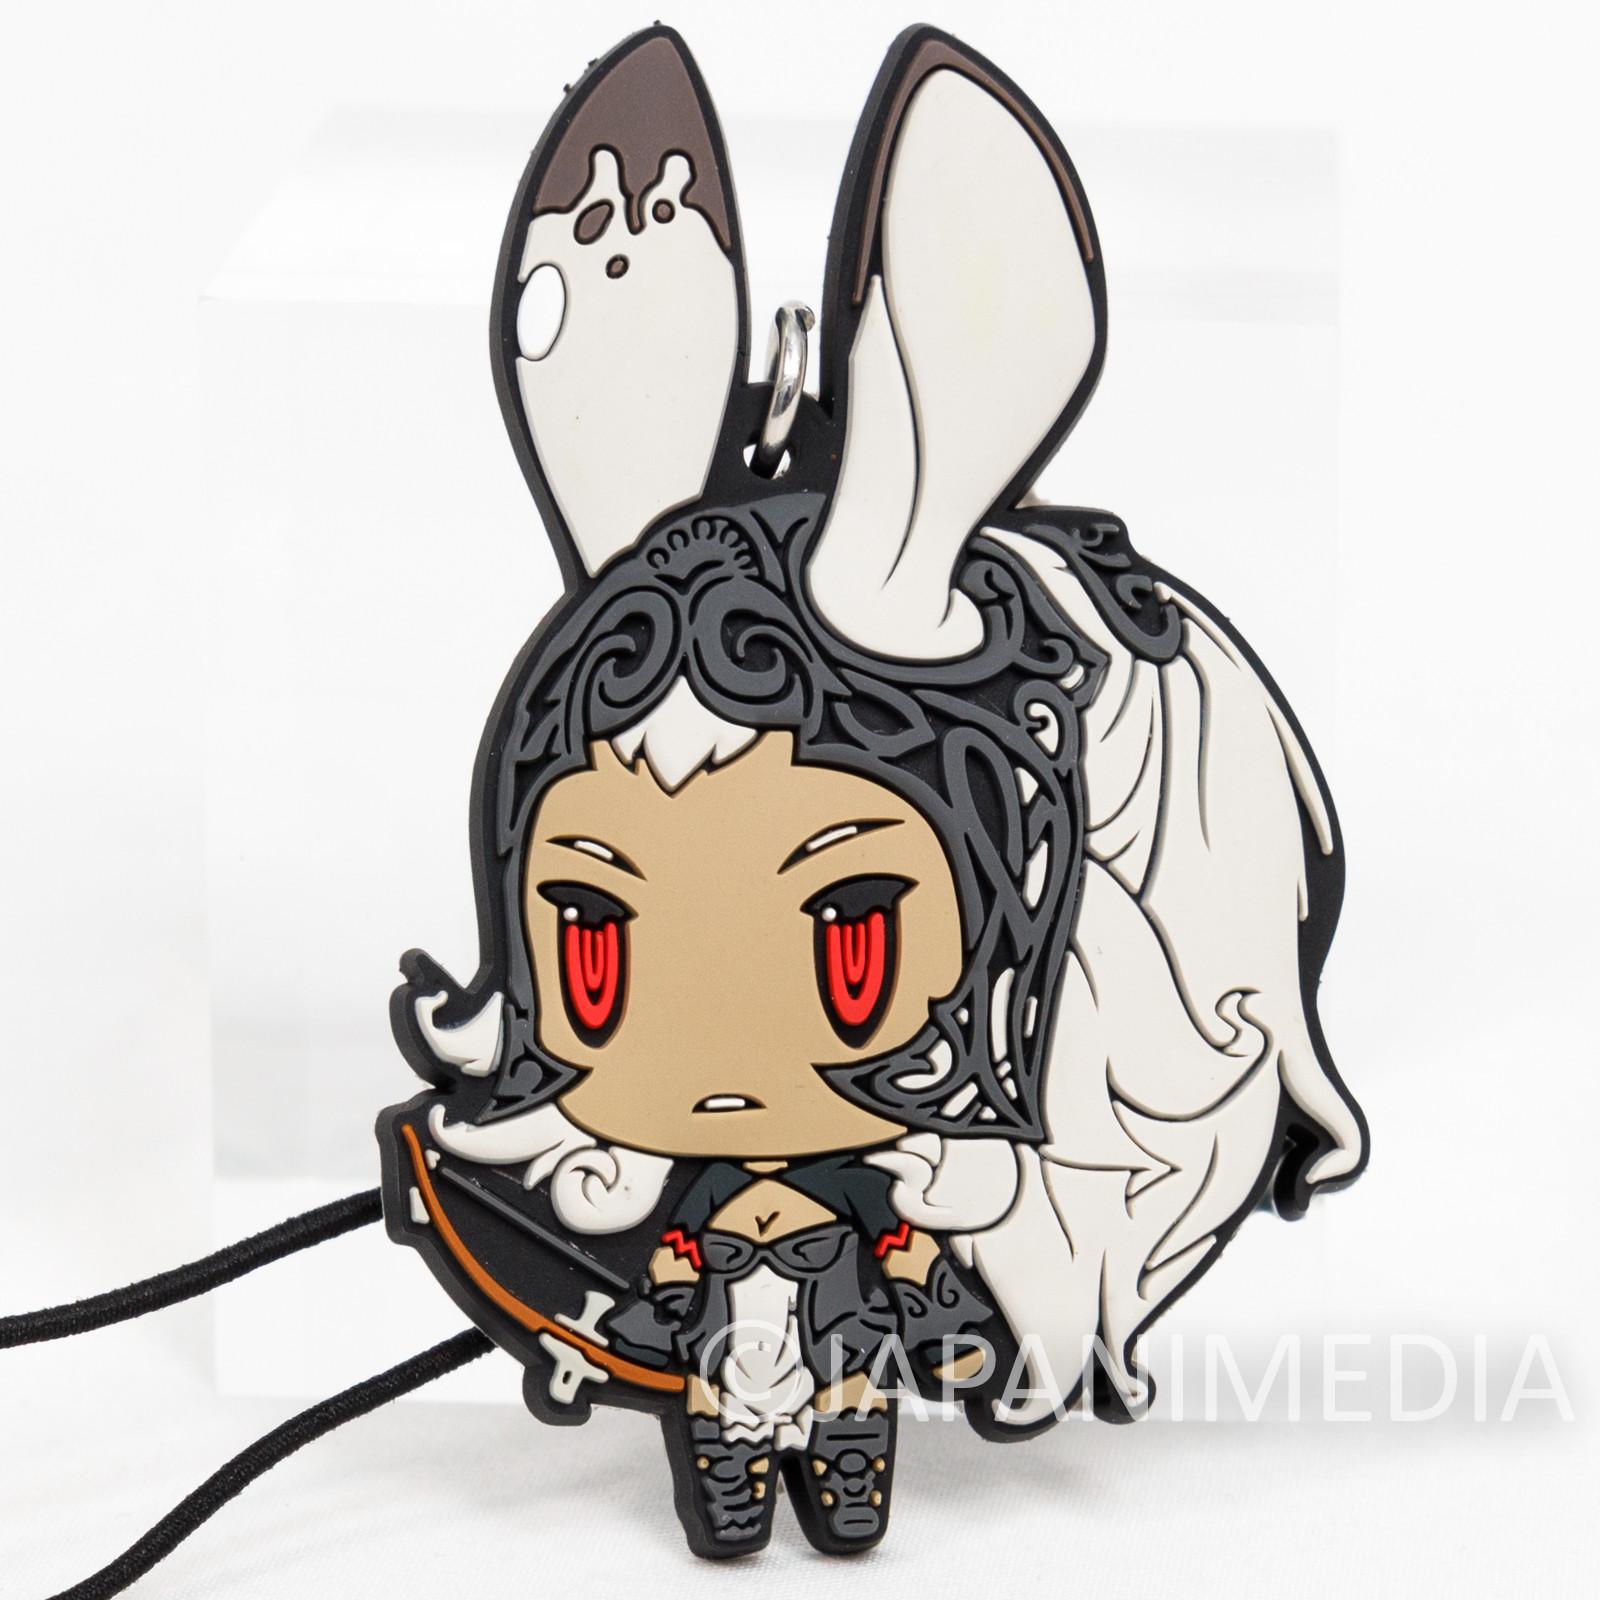 Final Fantasy Fran Mascot Rubber Strap JAPAN SQUARE ENIX